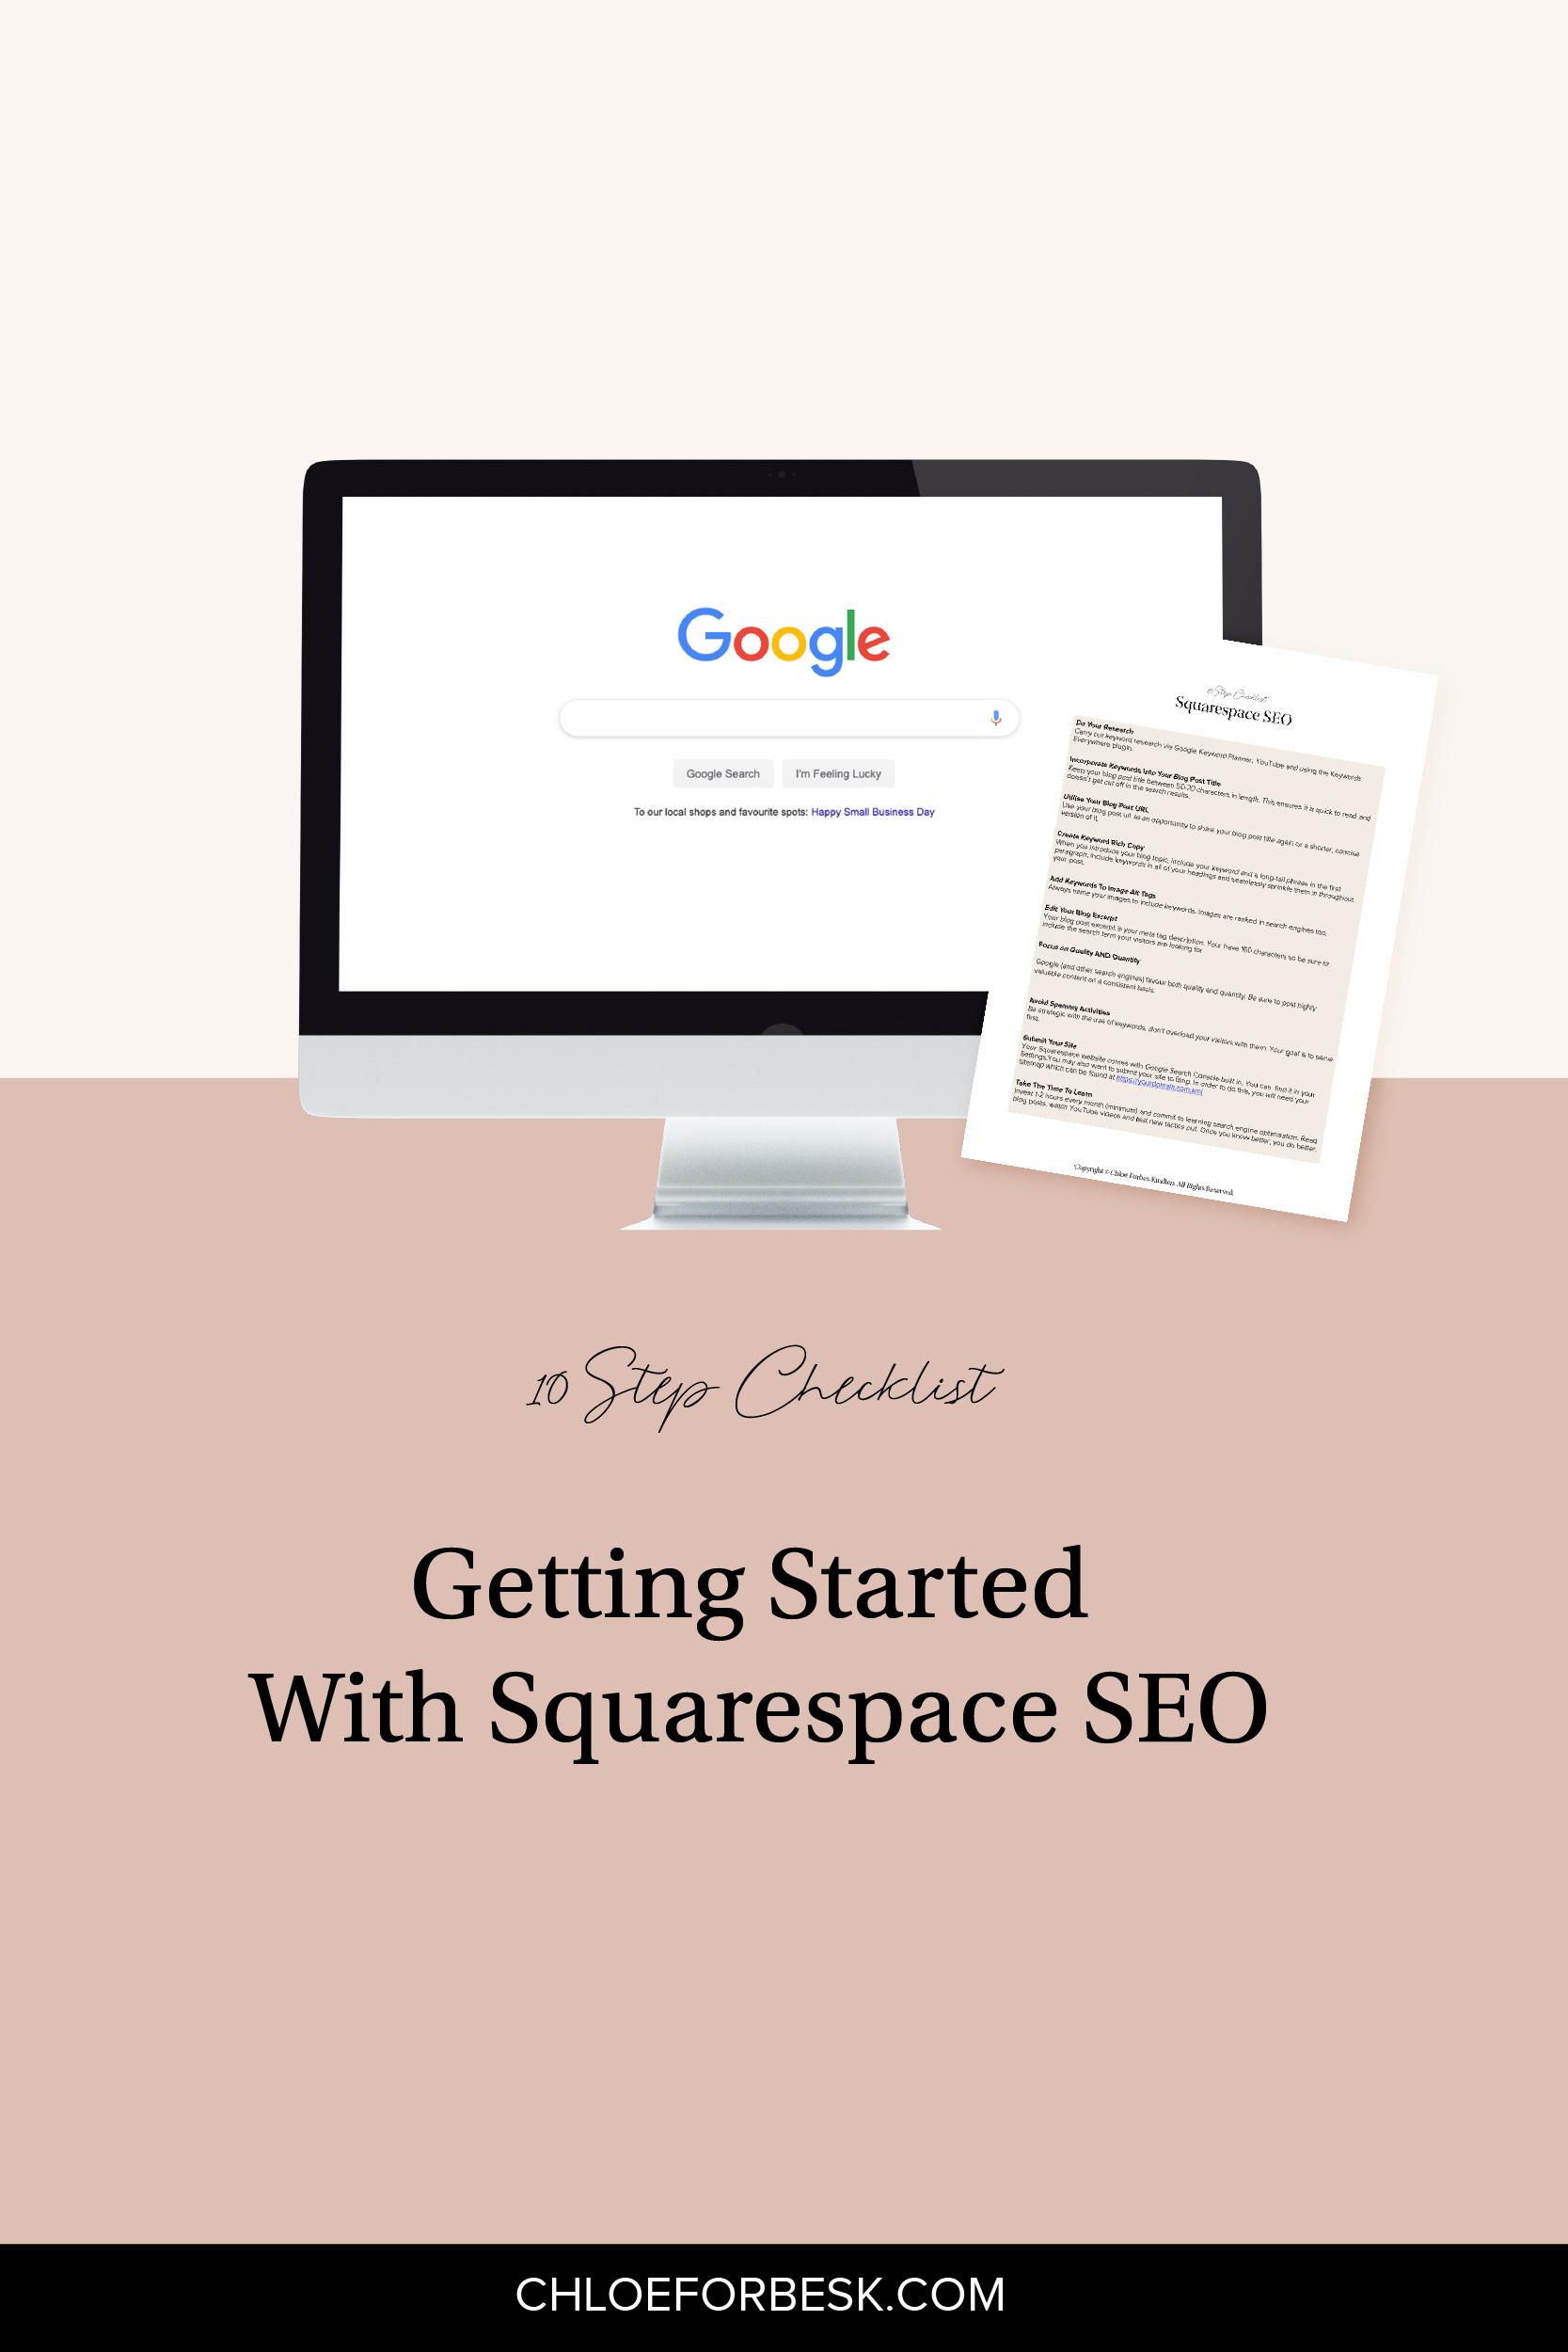 Squarespace SEO- 10 Step Checklist-01.png